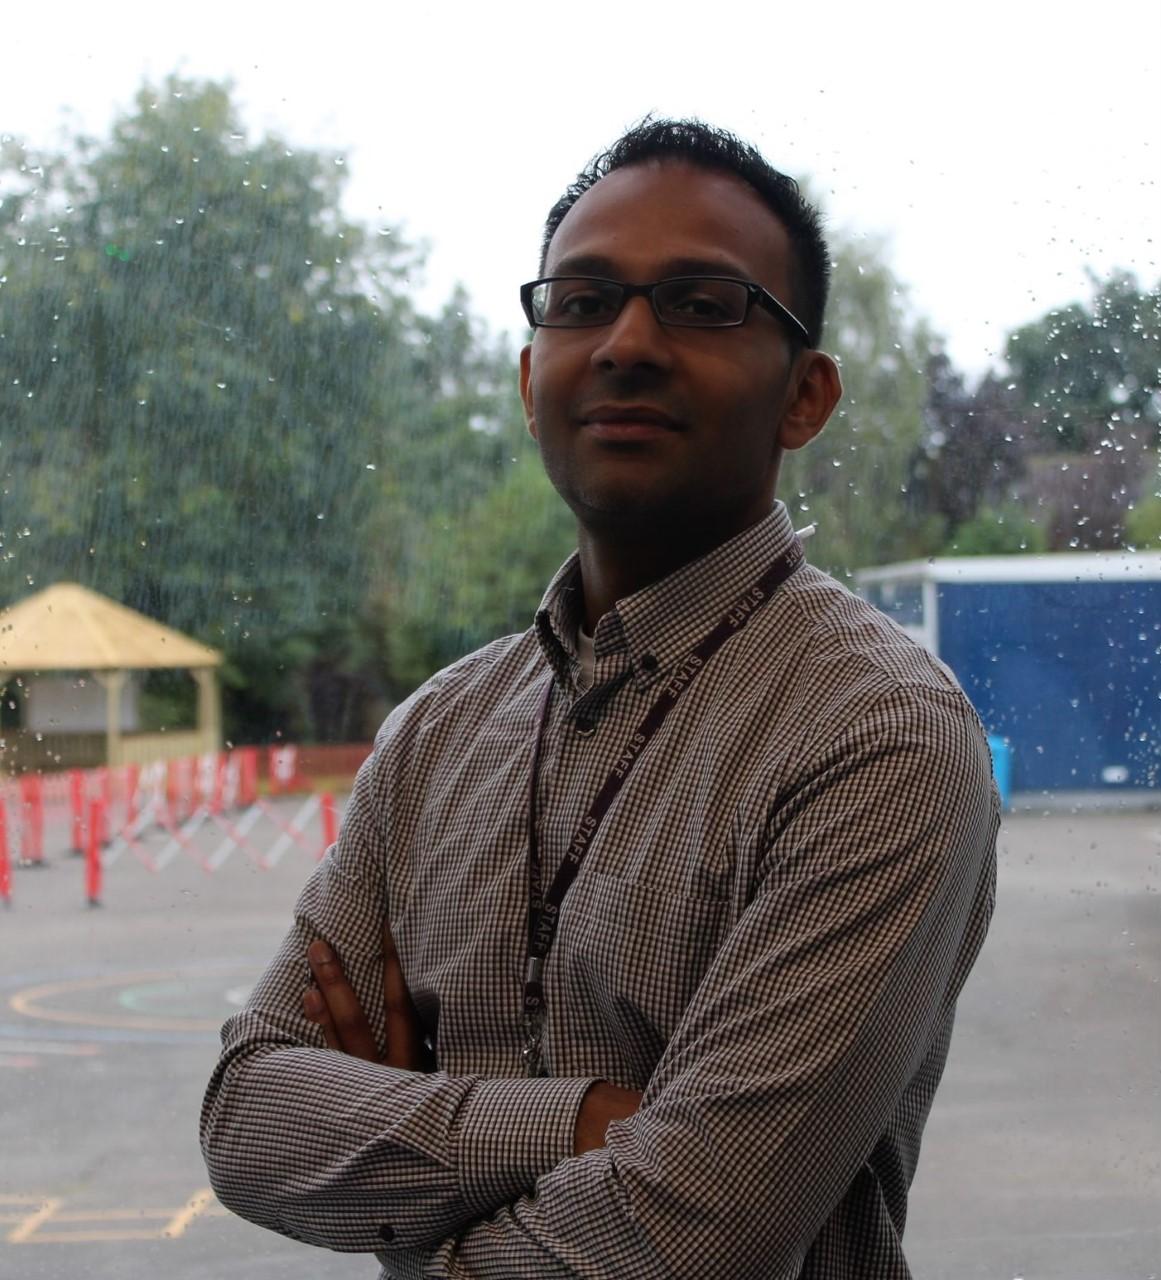 https://www.learningtoshapebirmingham.co.uk/wp-content/uploads/2020/09/Munsur-Ali.jpg